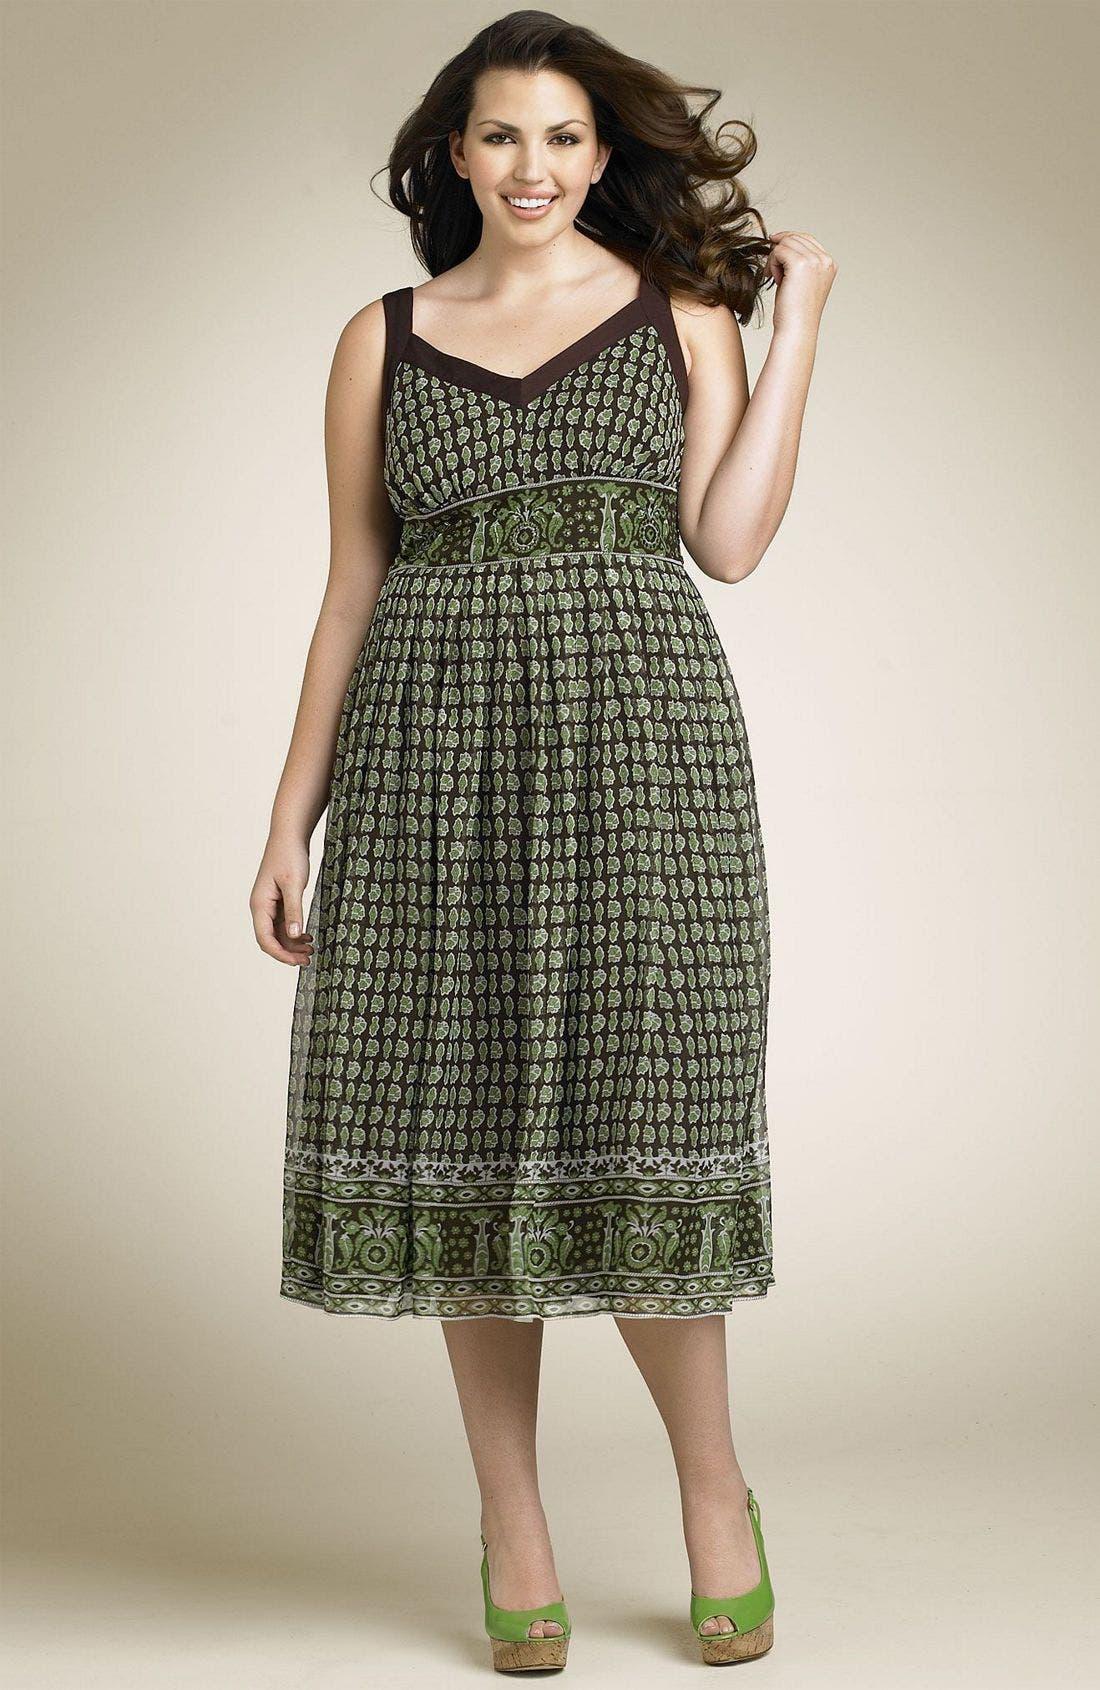 Alternate Image 1 Selected - Robbie Bee Border Silk Chiffon Dress (Plus)